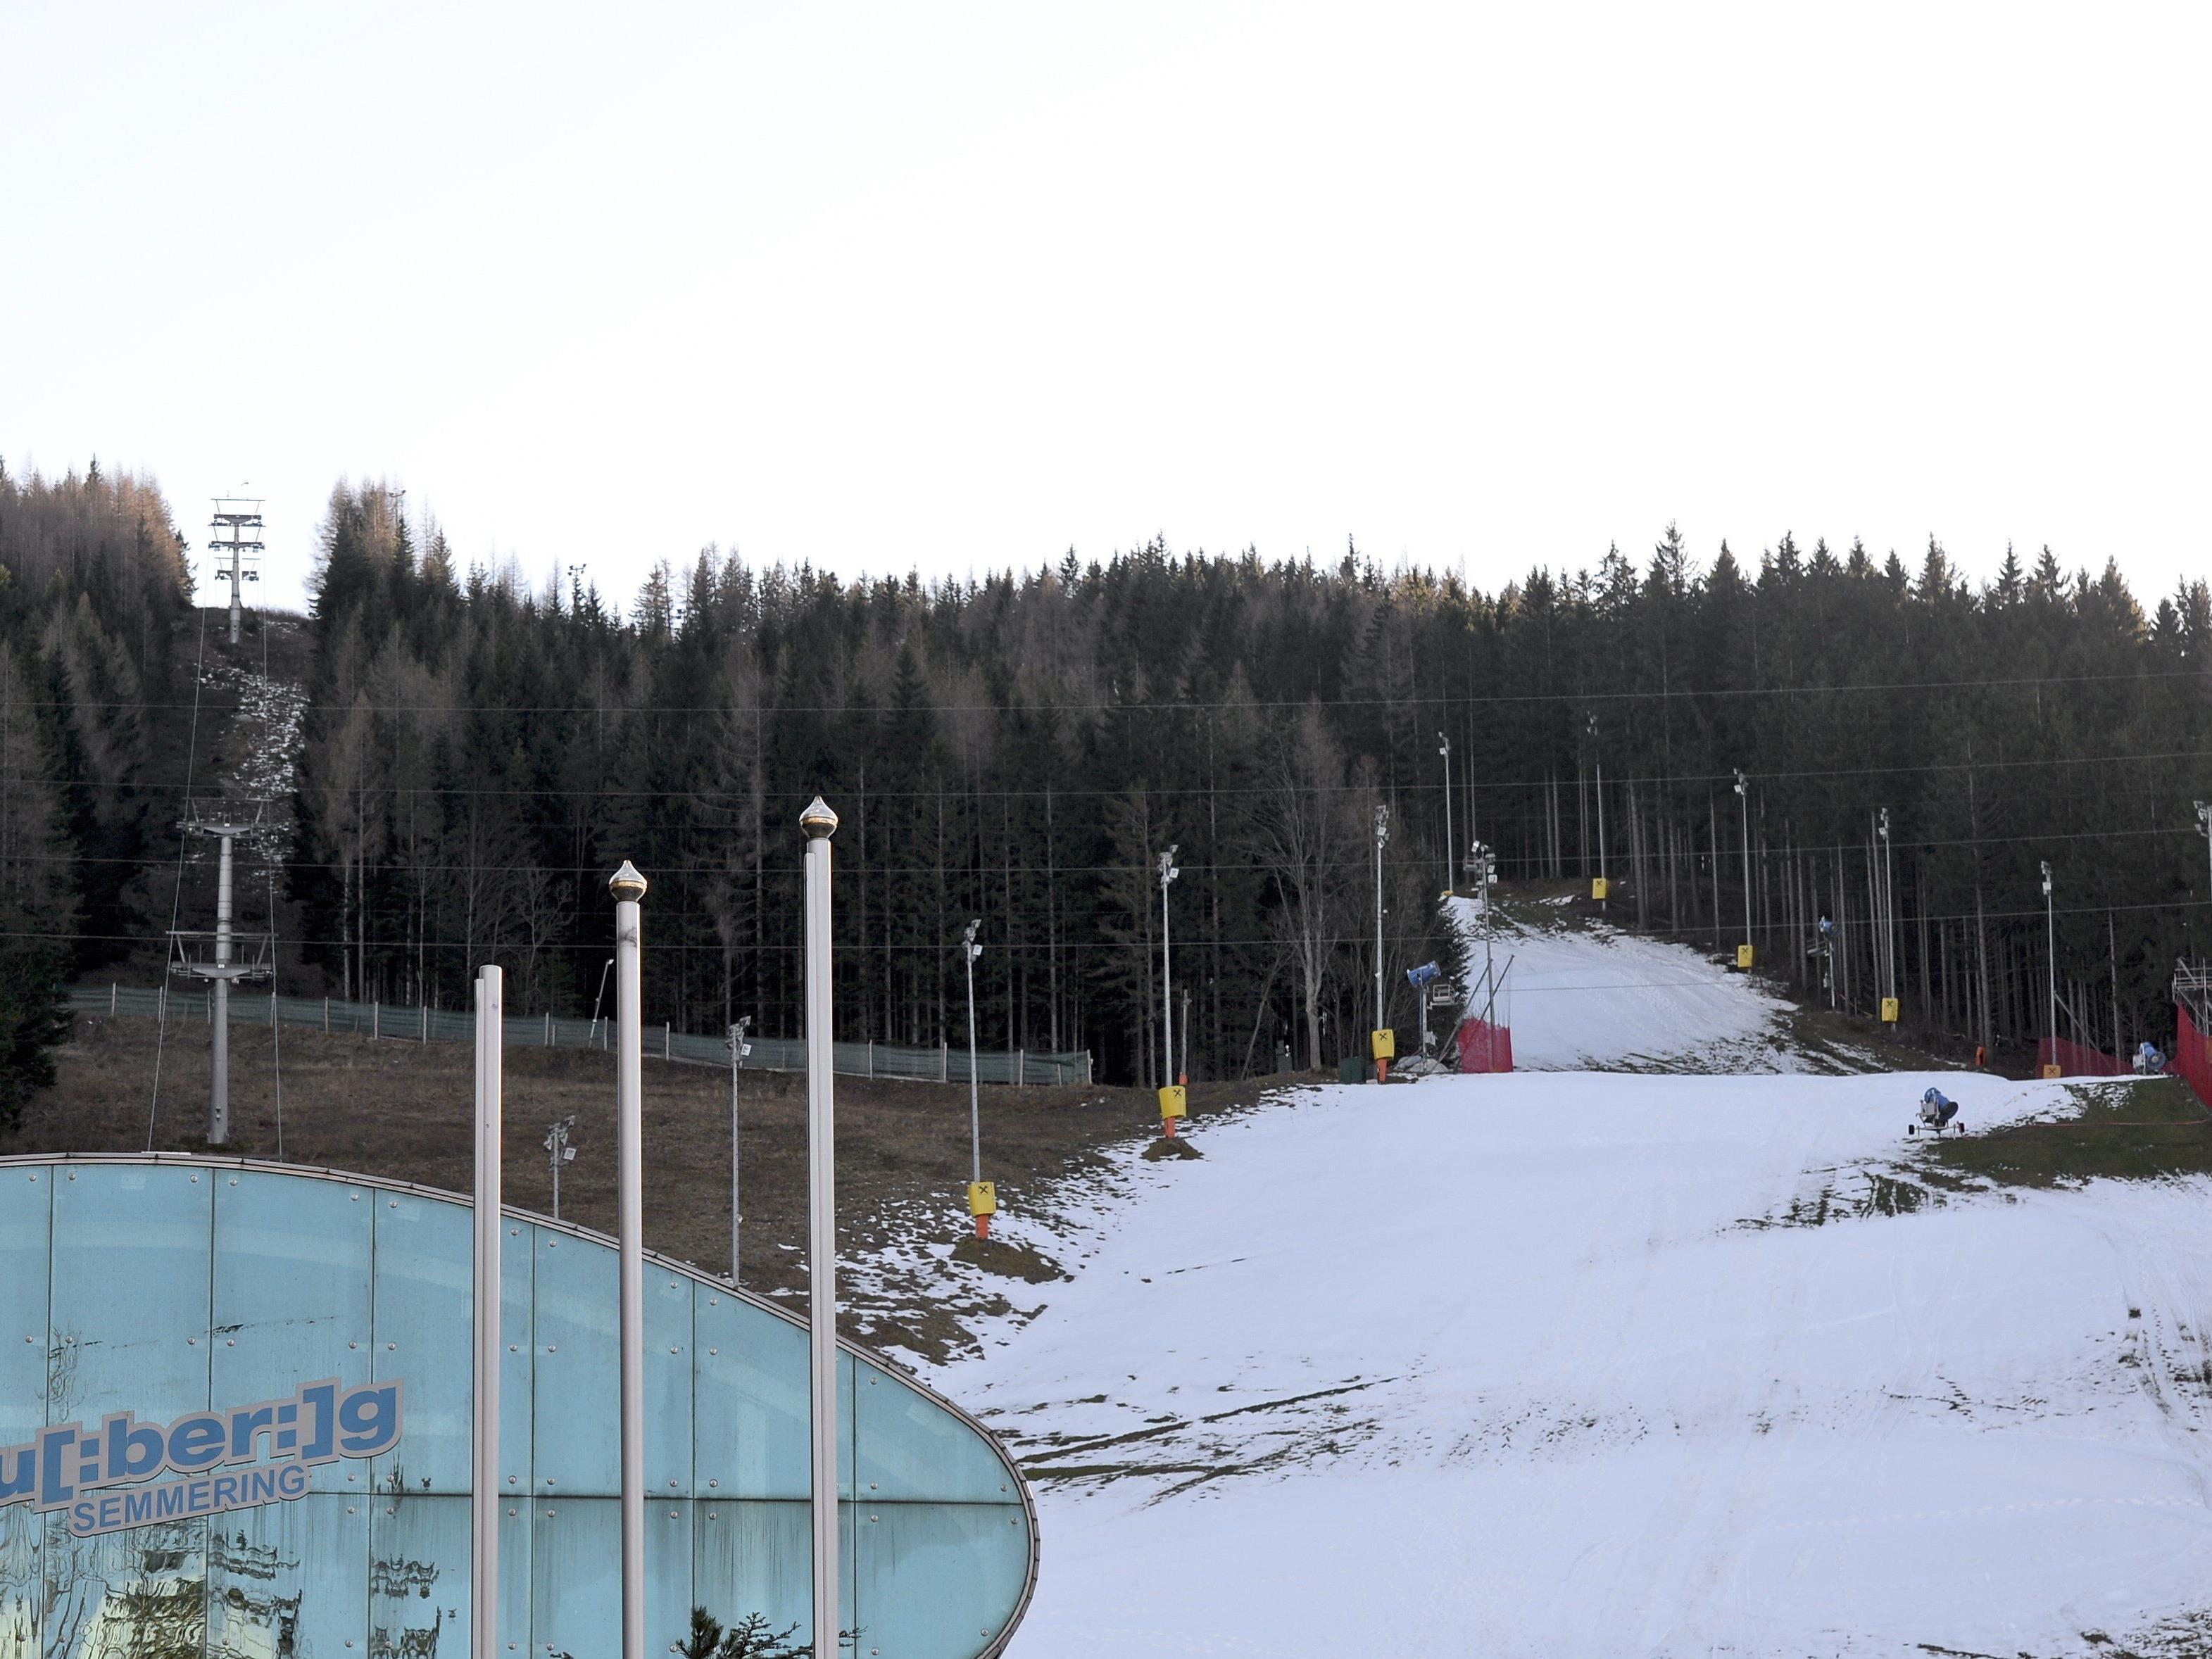 Zum gleichen Termin, aber Tag-Slalom.